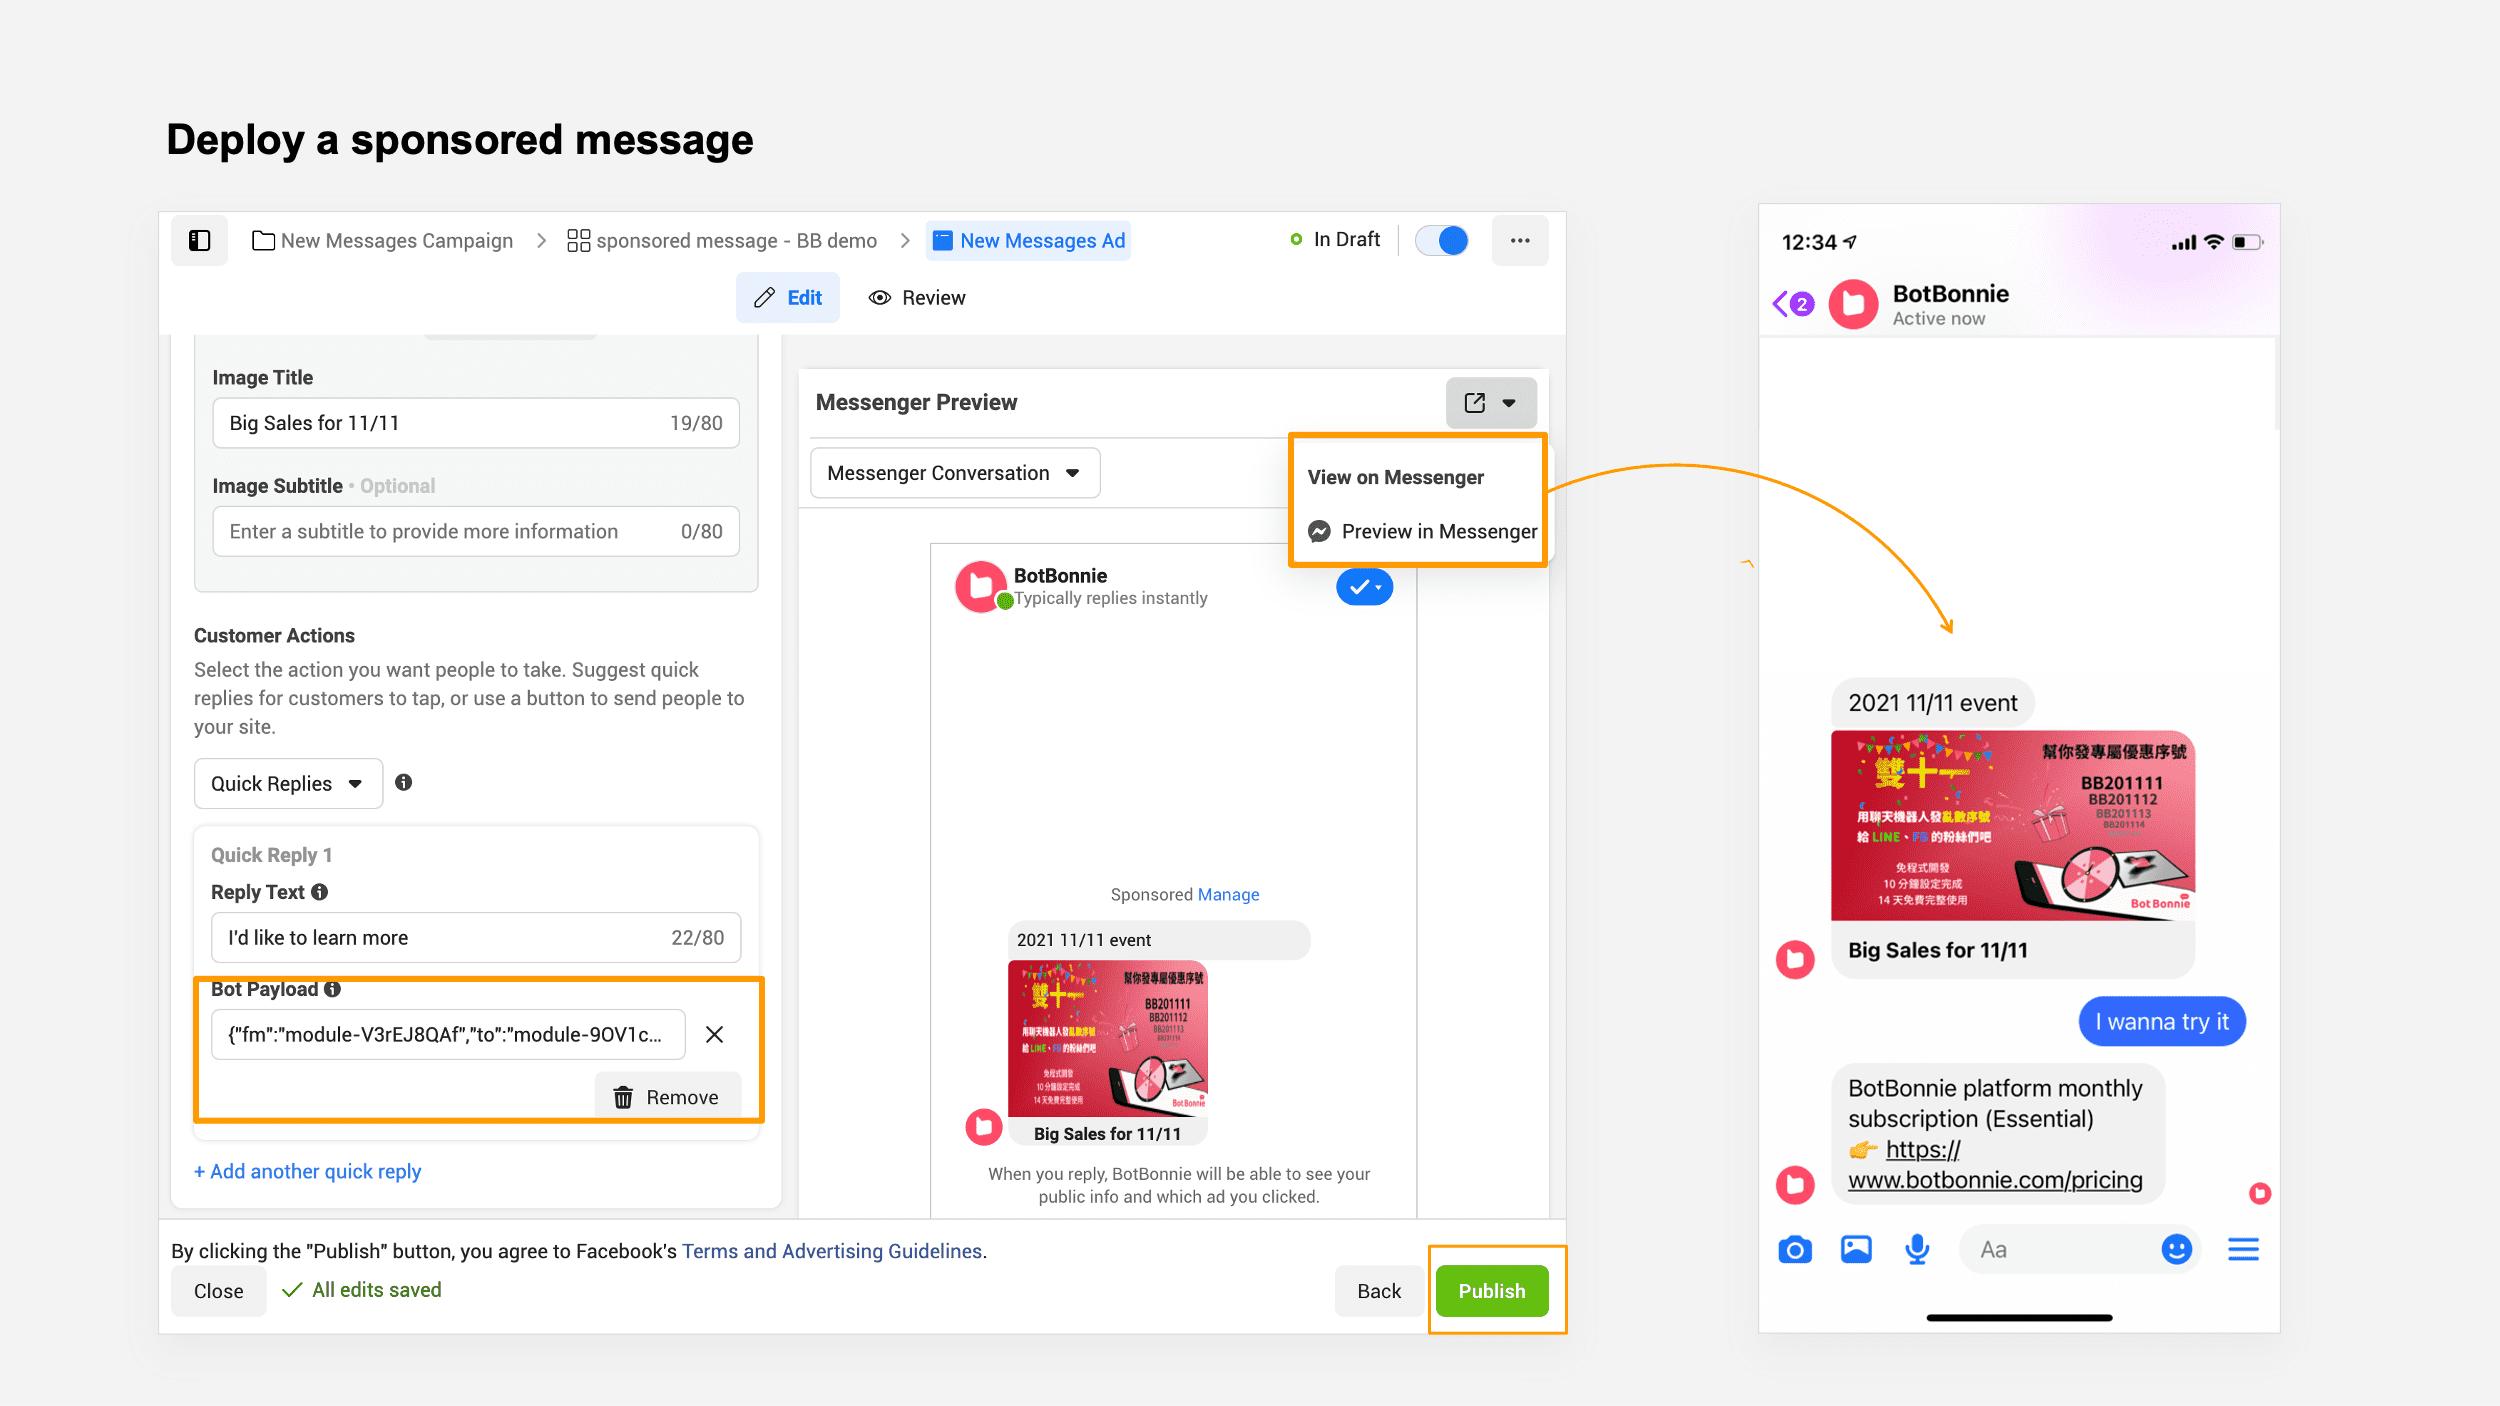 Deploy a sponsored message